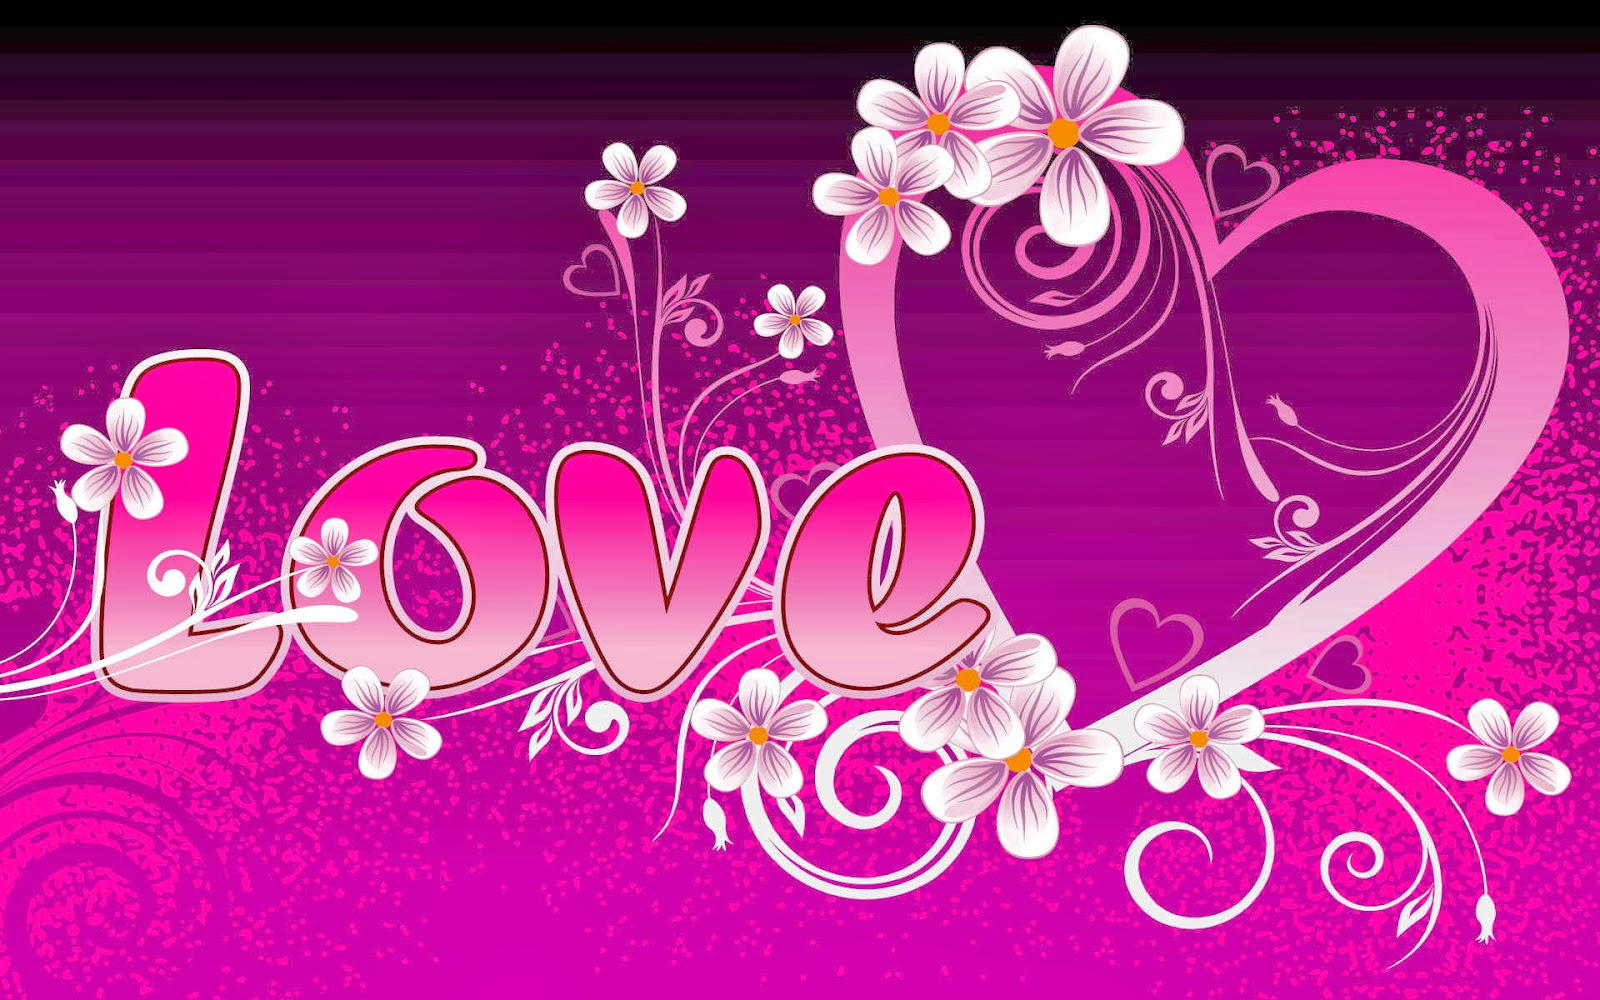 GAMBAR KATA VALENTINE ROMANTIS Download Gambar DP Animasi